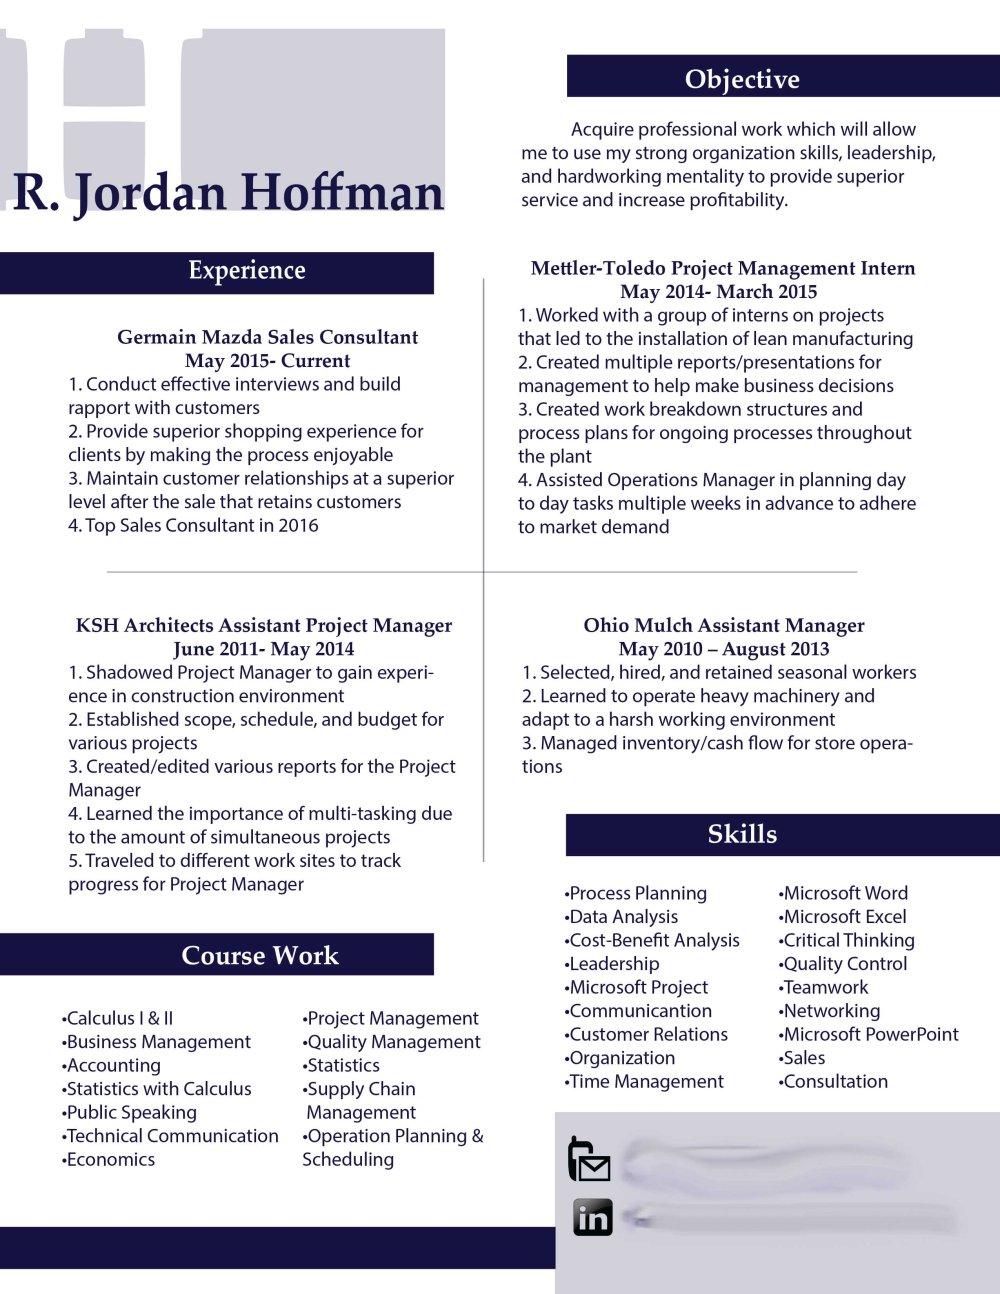 JordanhoffmanresumePDF